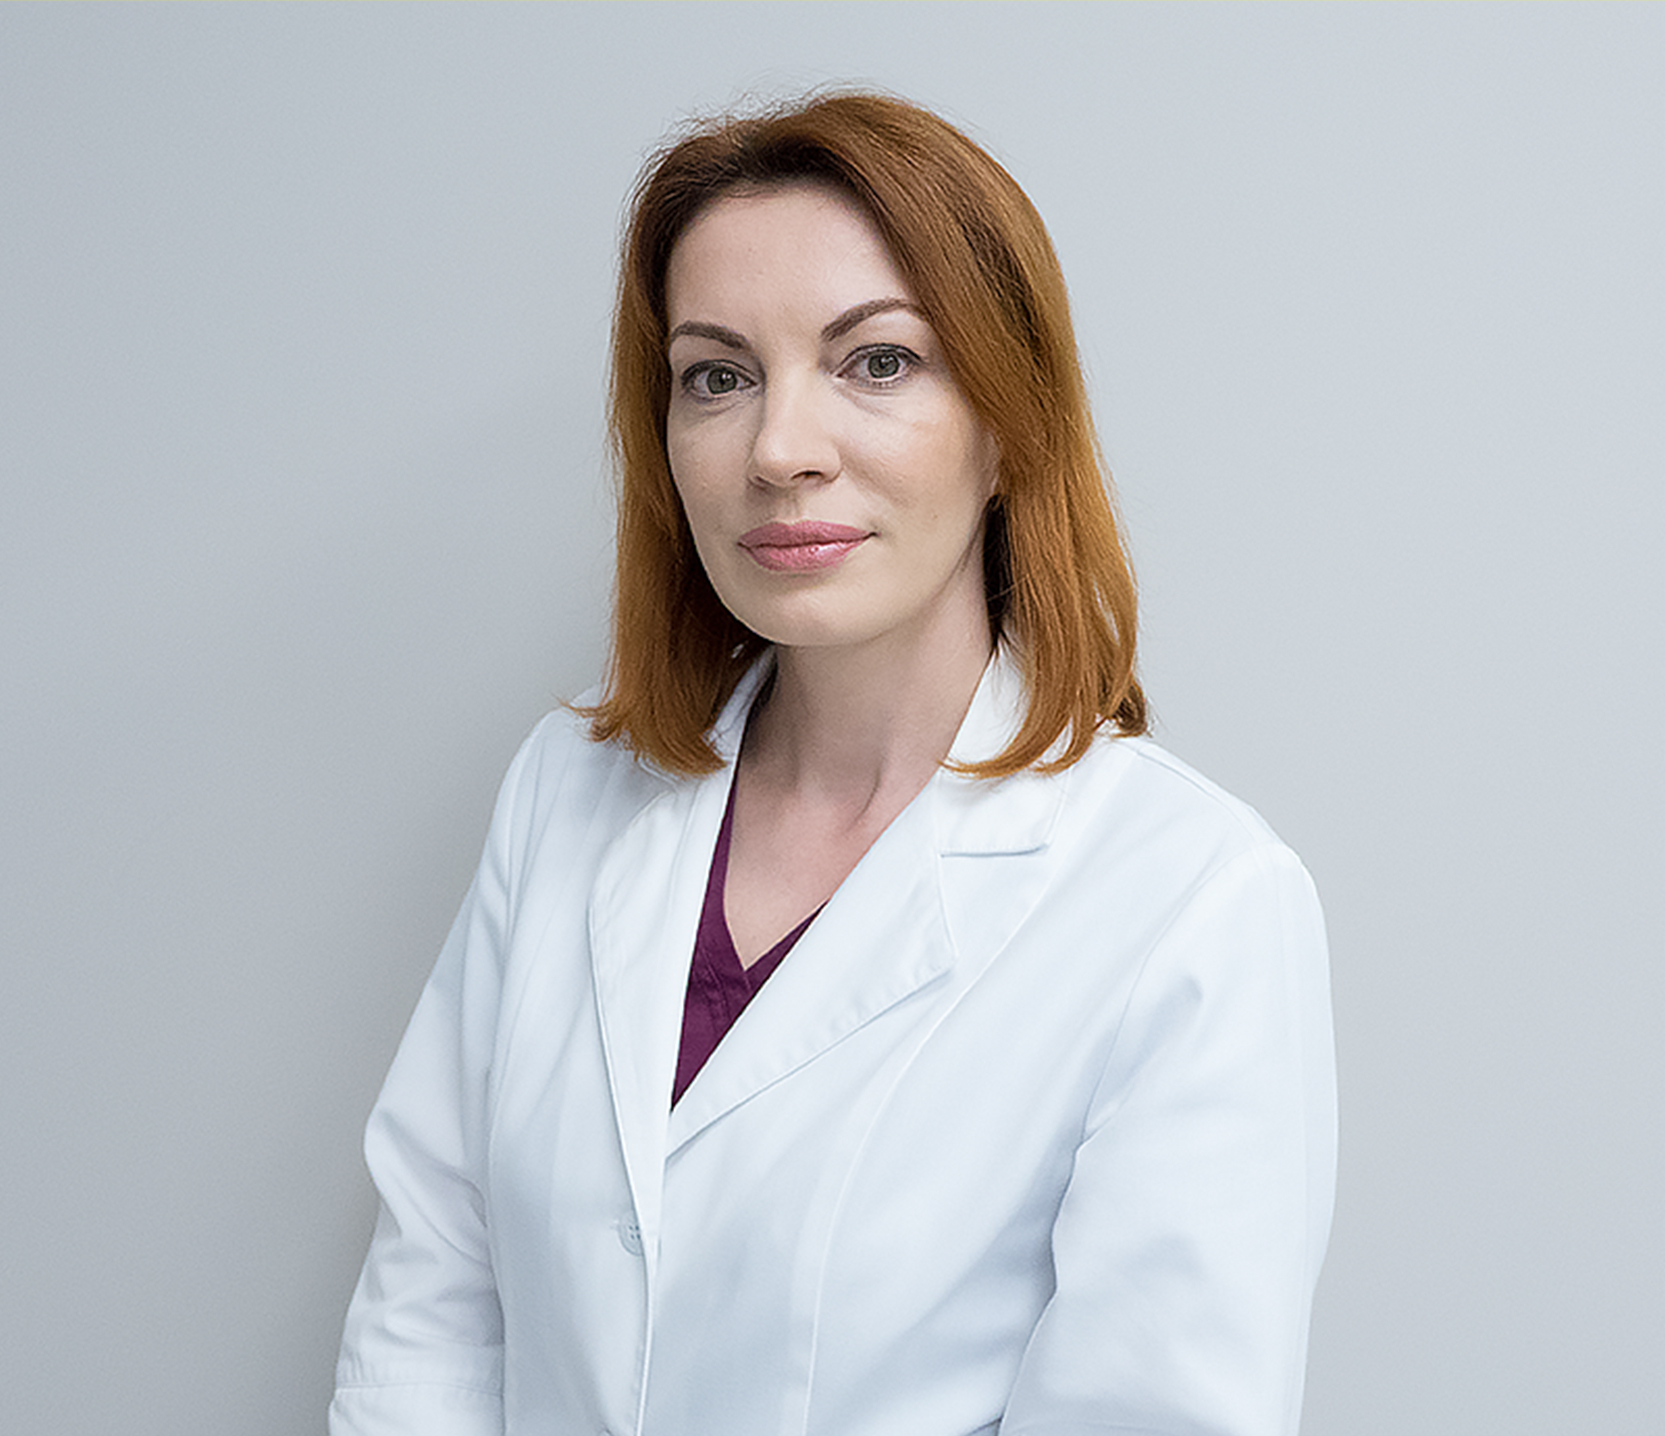 Парпалей Каролина Константиновна